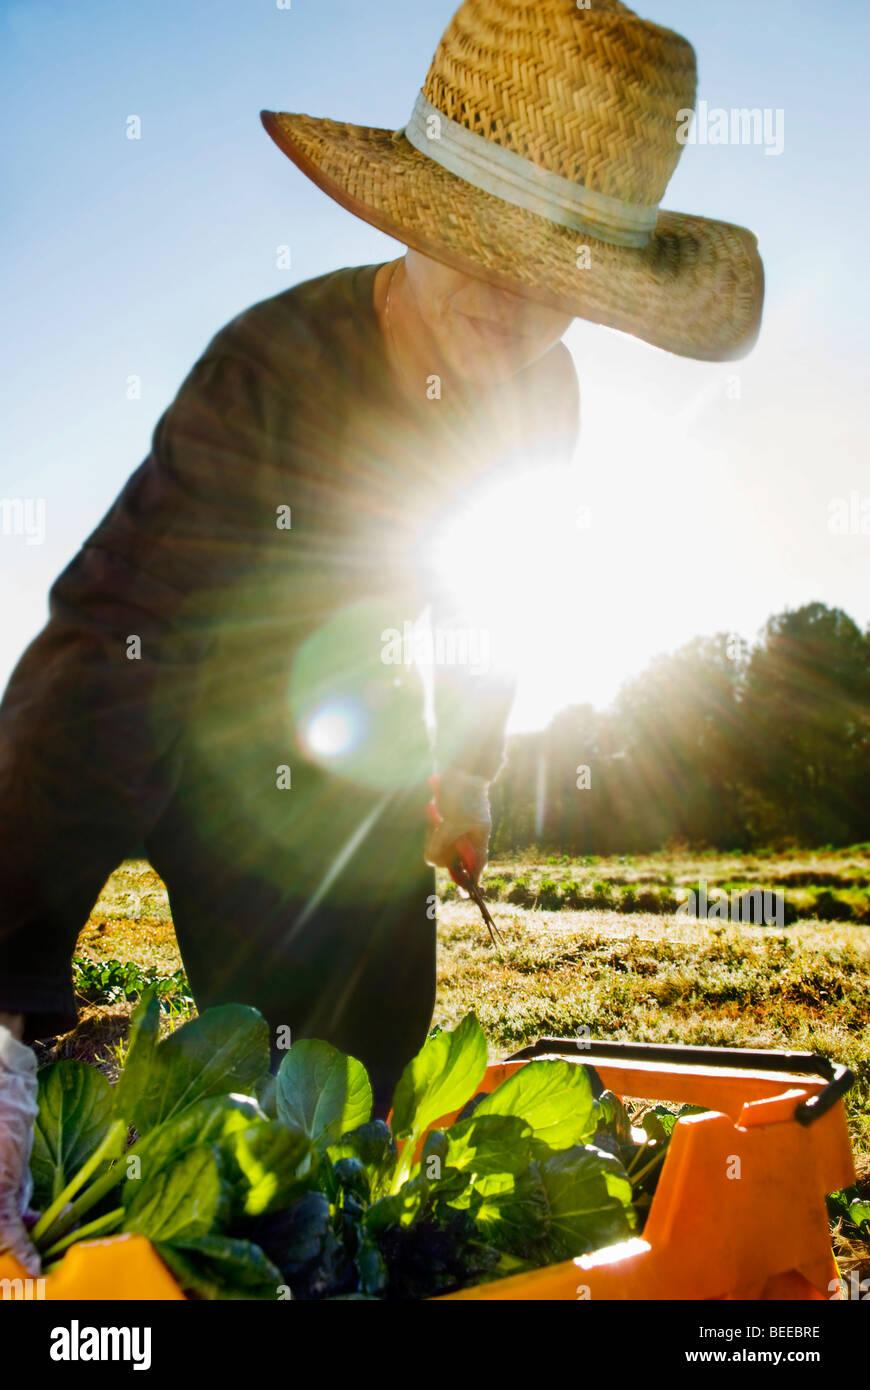 Organic tatsoi farm - Certified Organic Producer Stock Photo